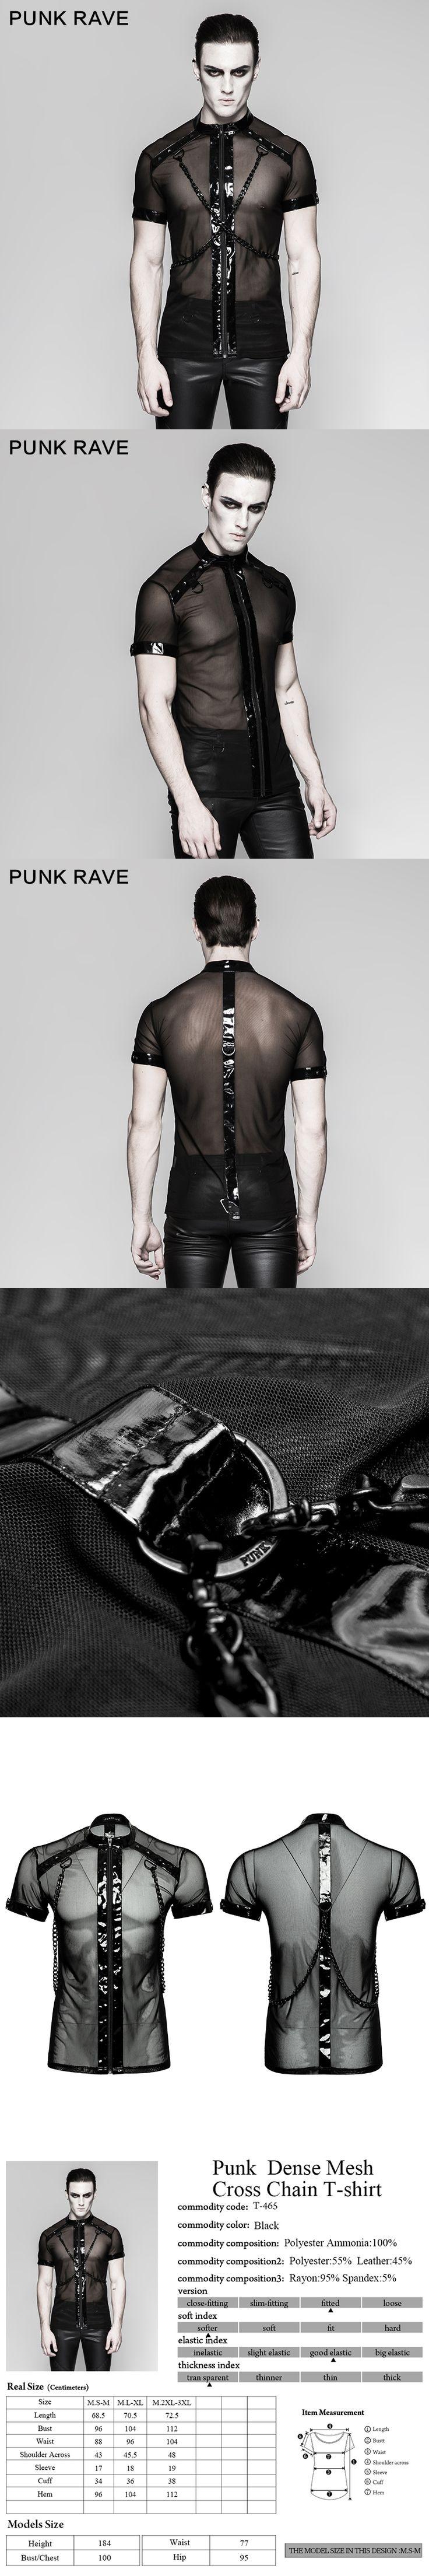 Punk Rave Men's sexy Performance transparent Minimalist Dense Mesh Small Stand Collar Cross Chain T-shirt T465